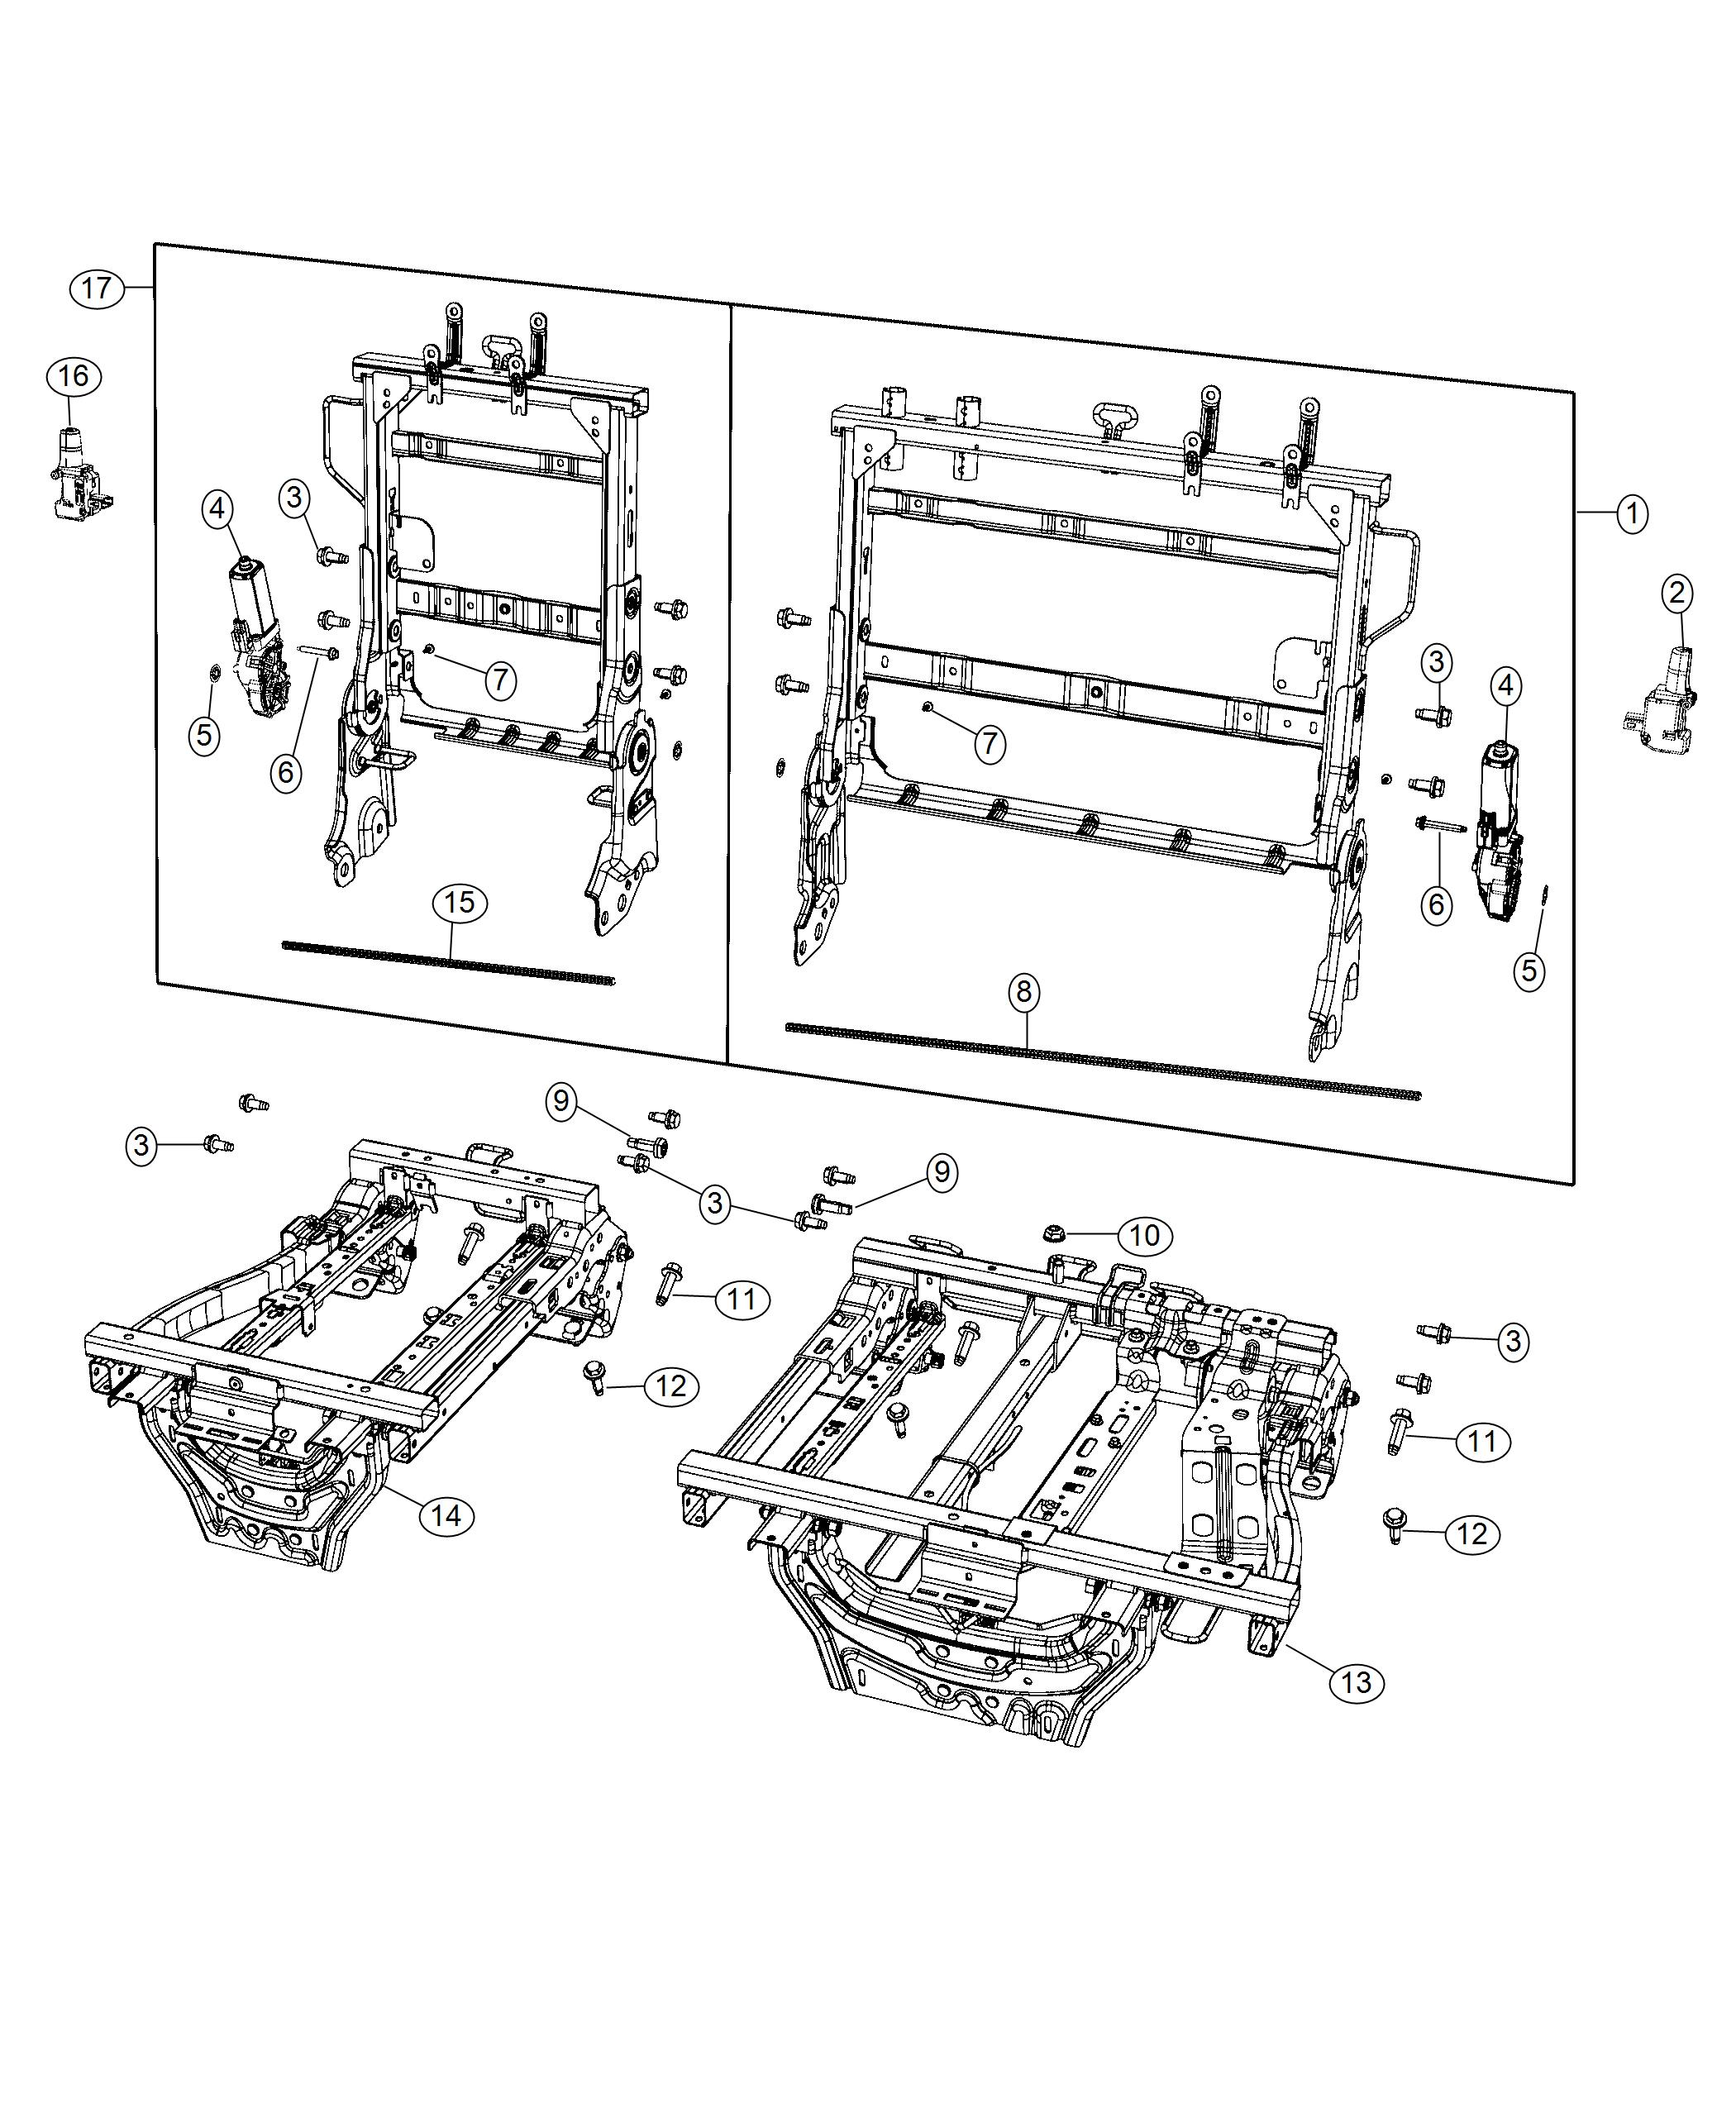 2019 Chrysler Pacifica Solenoid Module. Auto Headrest Dump